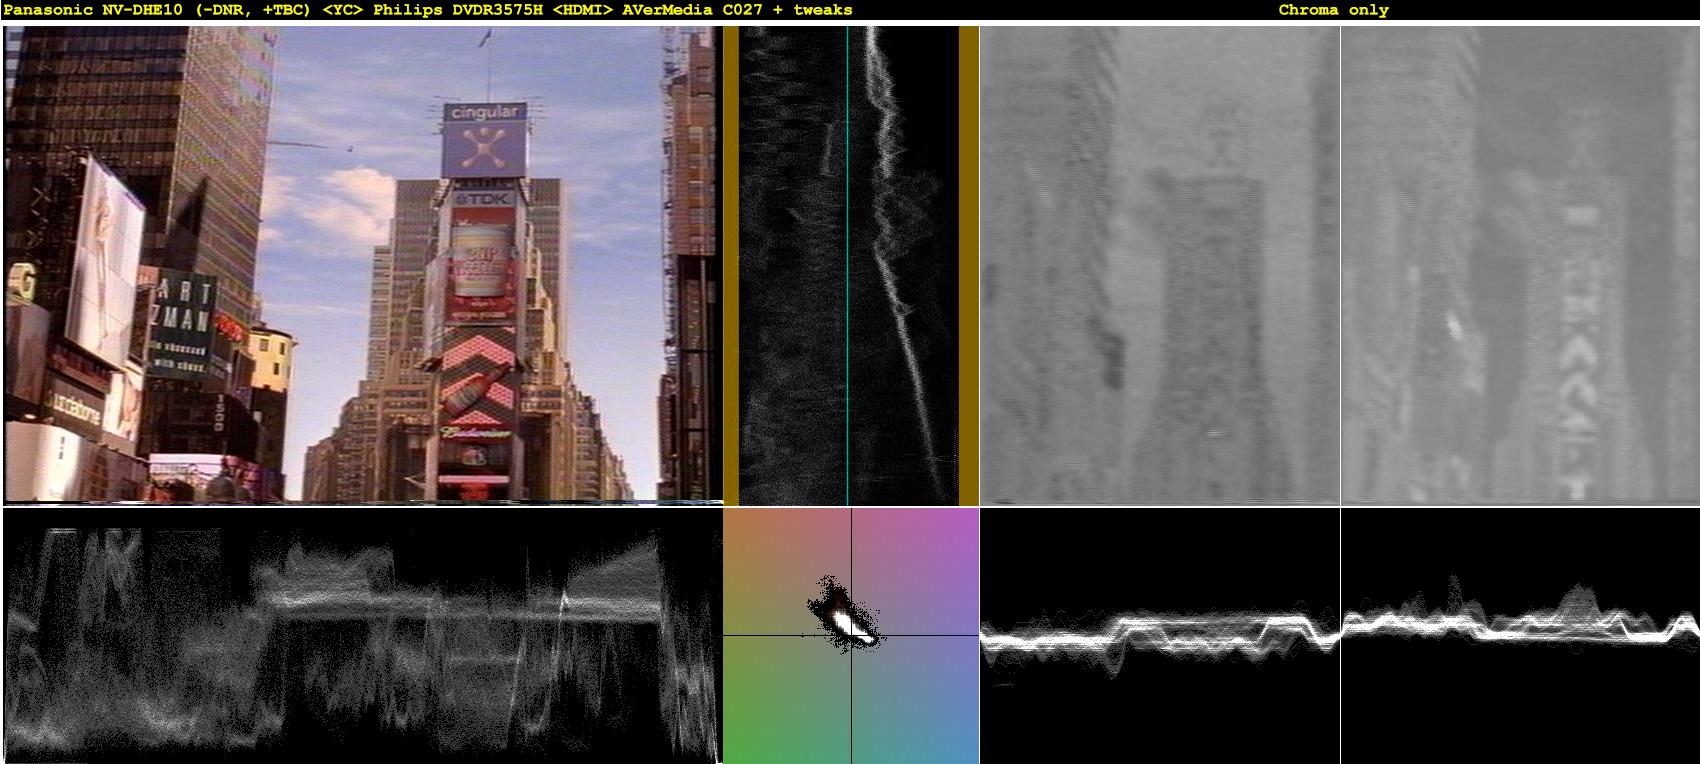 Click image for larger version  Name:1-14-17 - Panasonic NV-DHE10 (-DNR, +TBC).png Views:1537 Size:1.12 MB ID:37999